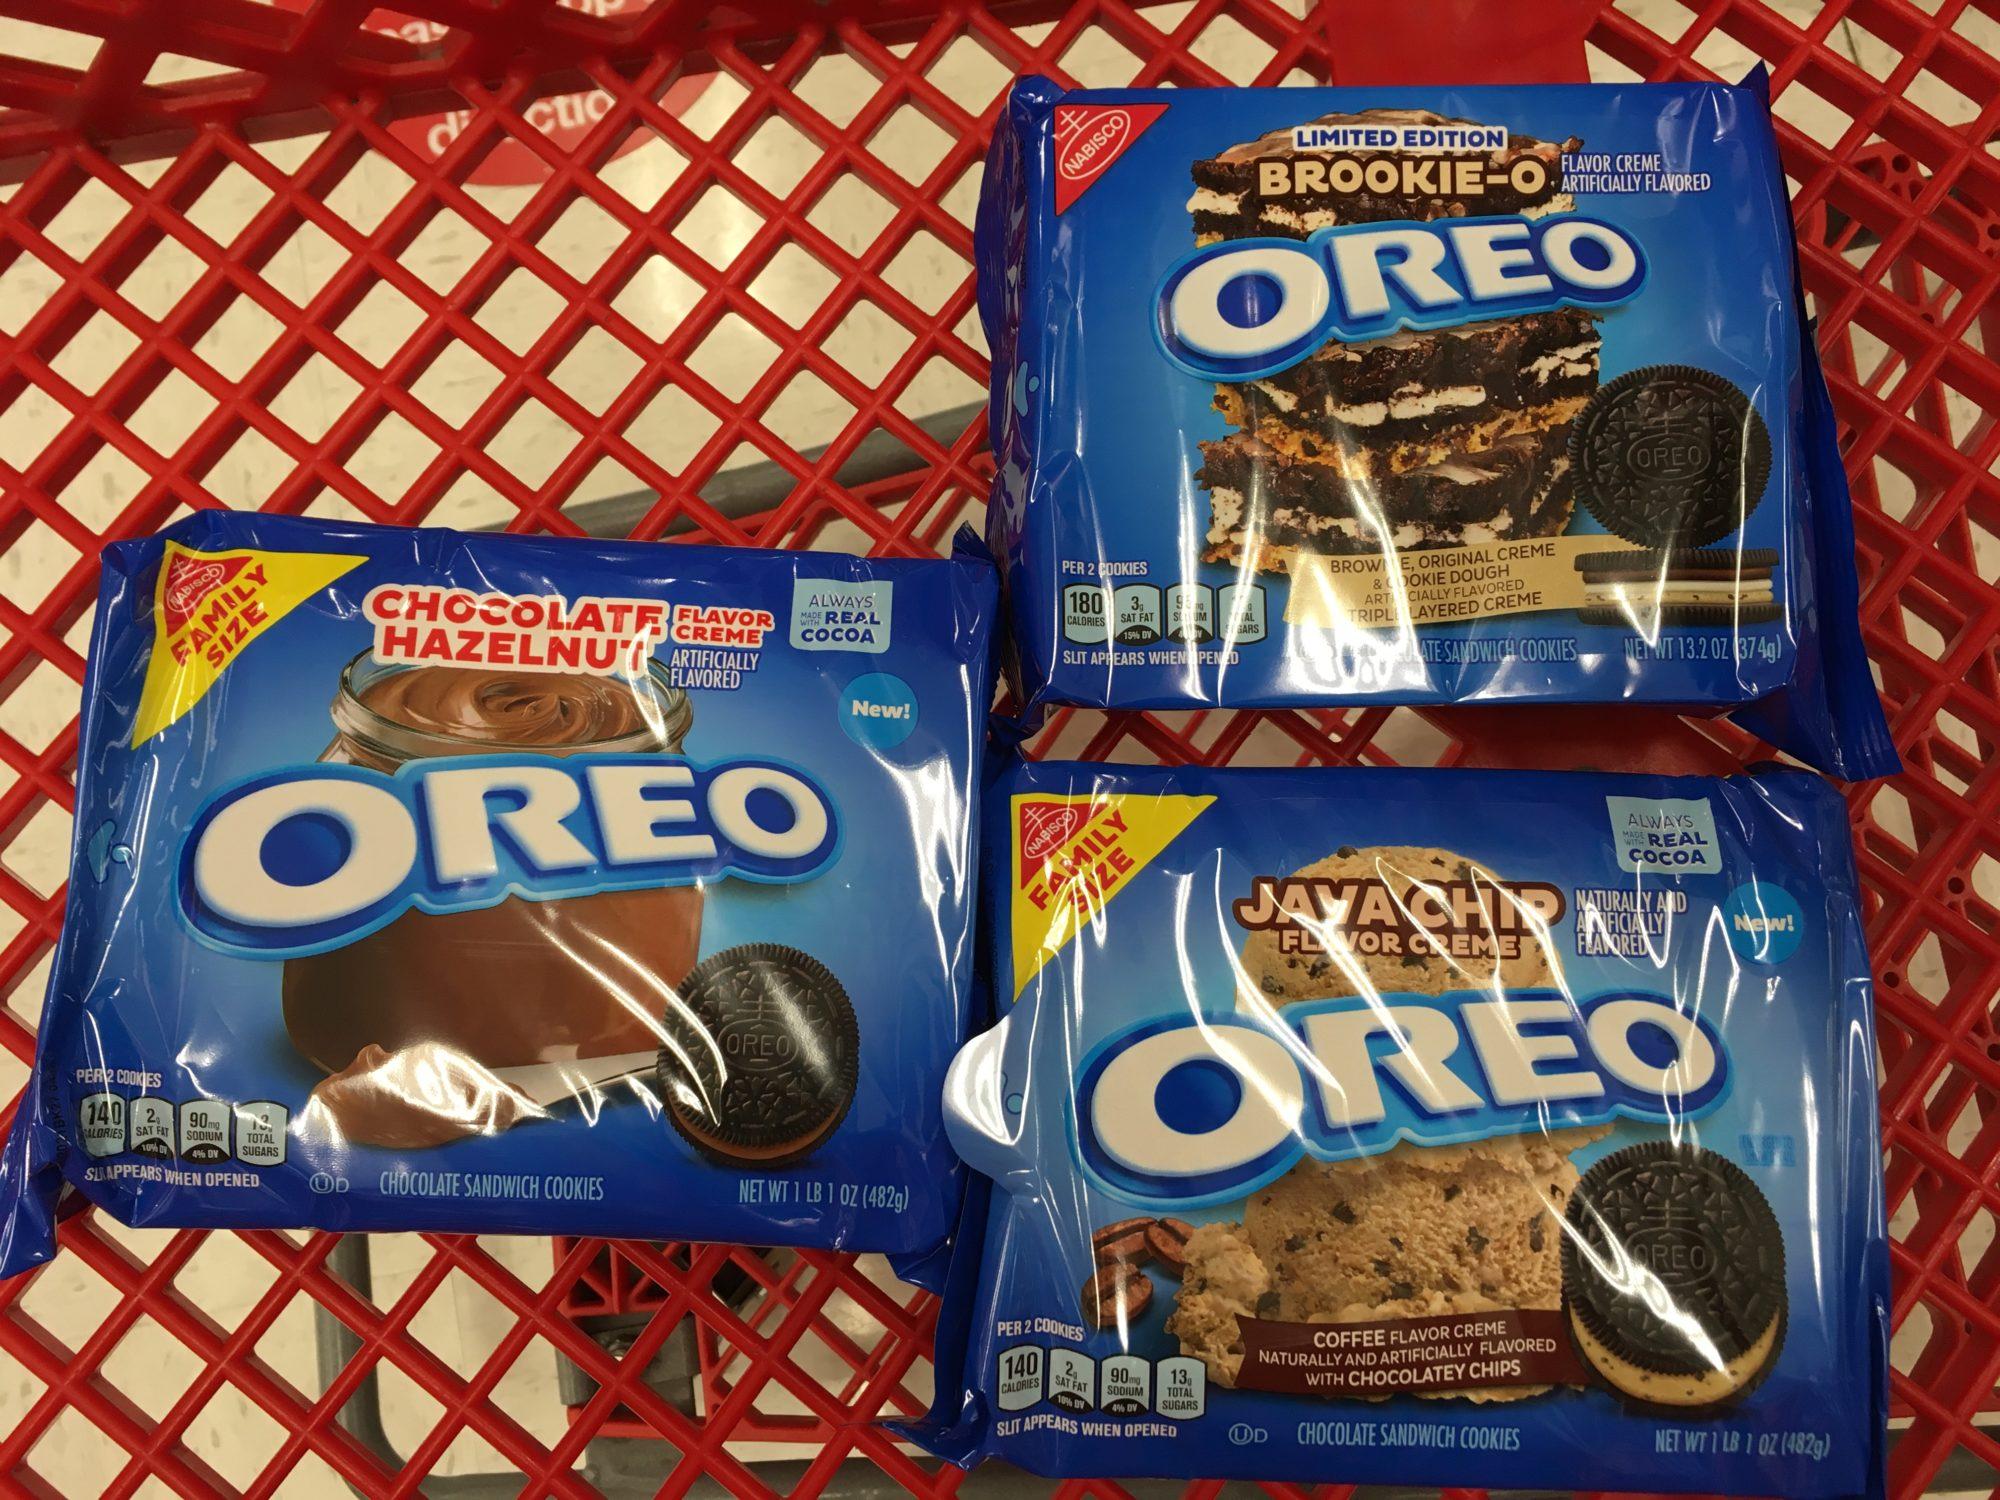 Oreo cookies new flavors 2021